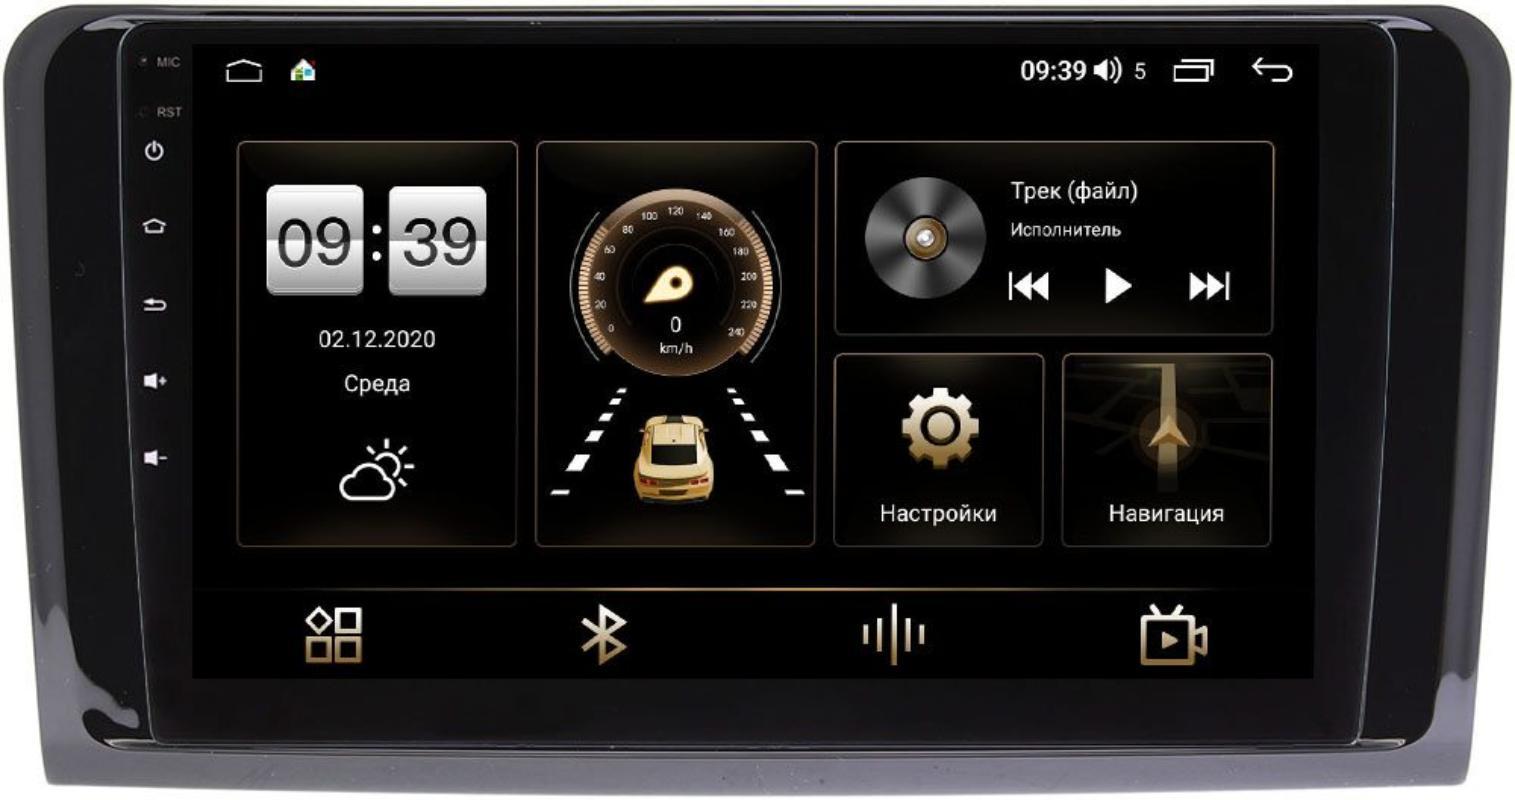 Штатная магнитола Mercedes GL-klasse (X164) 2006-2012, ML-klasse (W164) 2005-2011 (глянец) LeTrun 4196-9249 на Android 10 (6/128, DSP, QLed) С оптическим выходом (+ Камера заднего вида в подарок!)